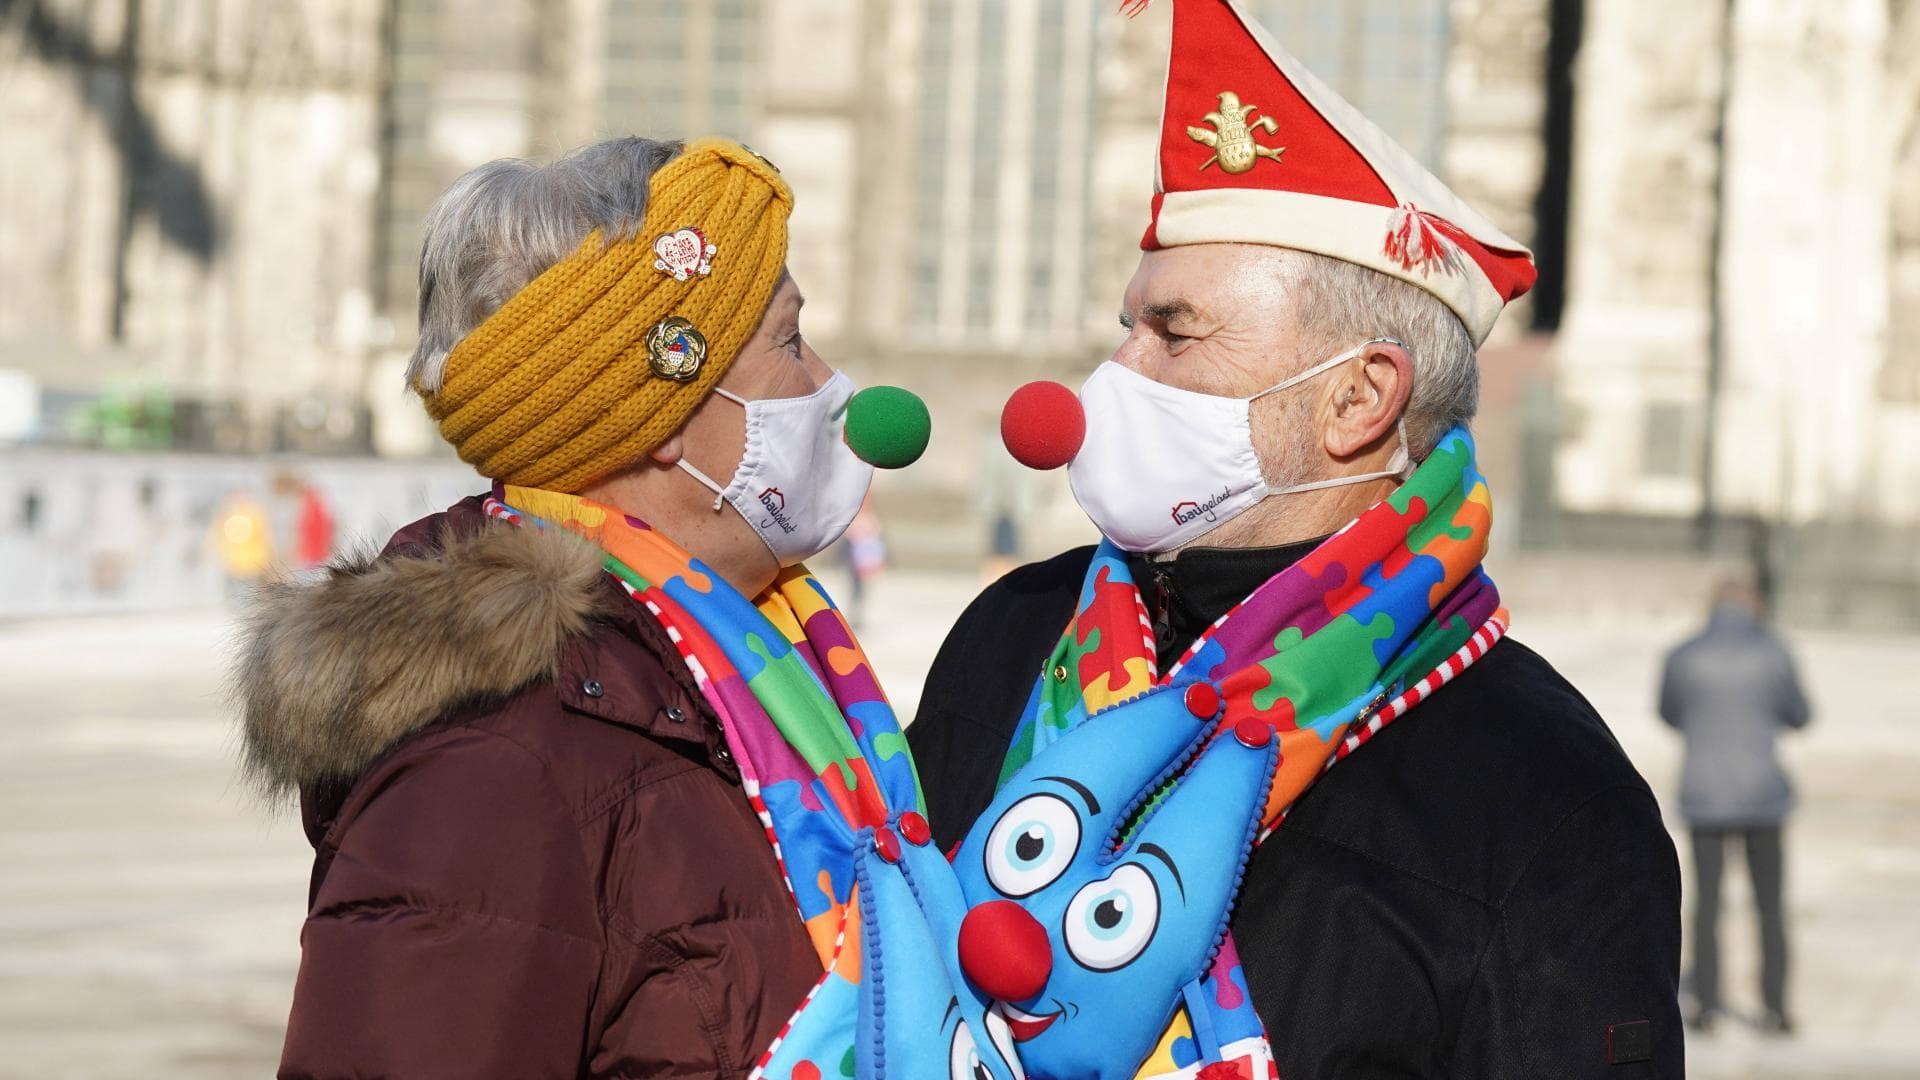 karneval mann frau maske clownsnase schal kölner dom